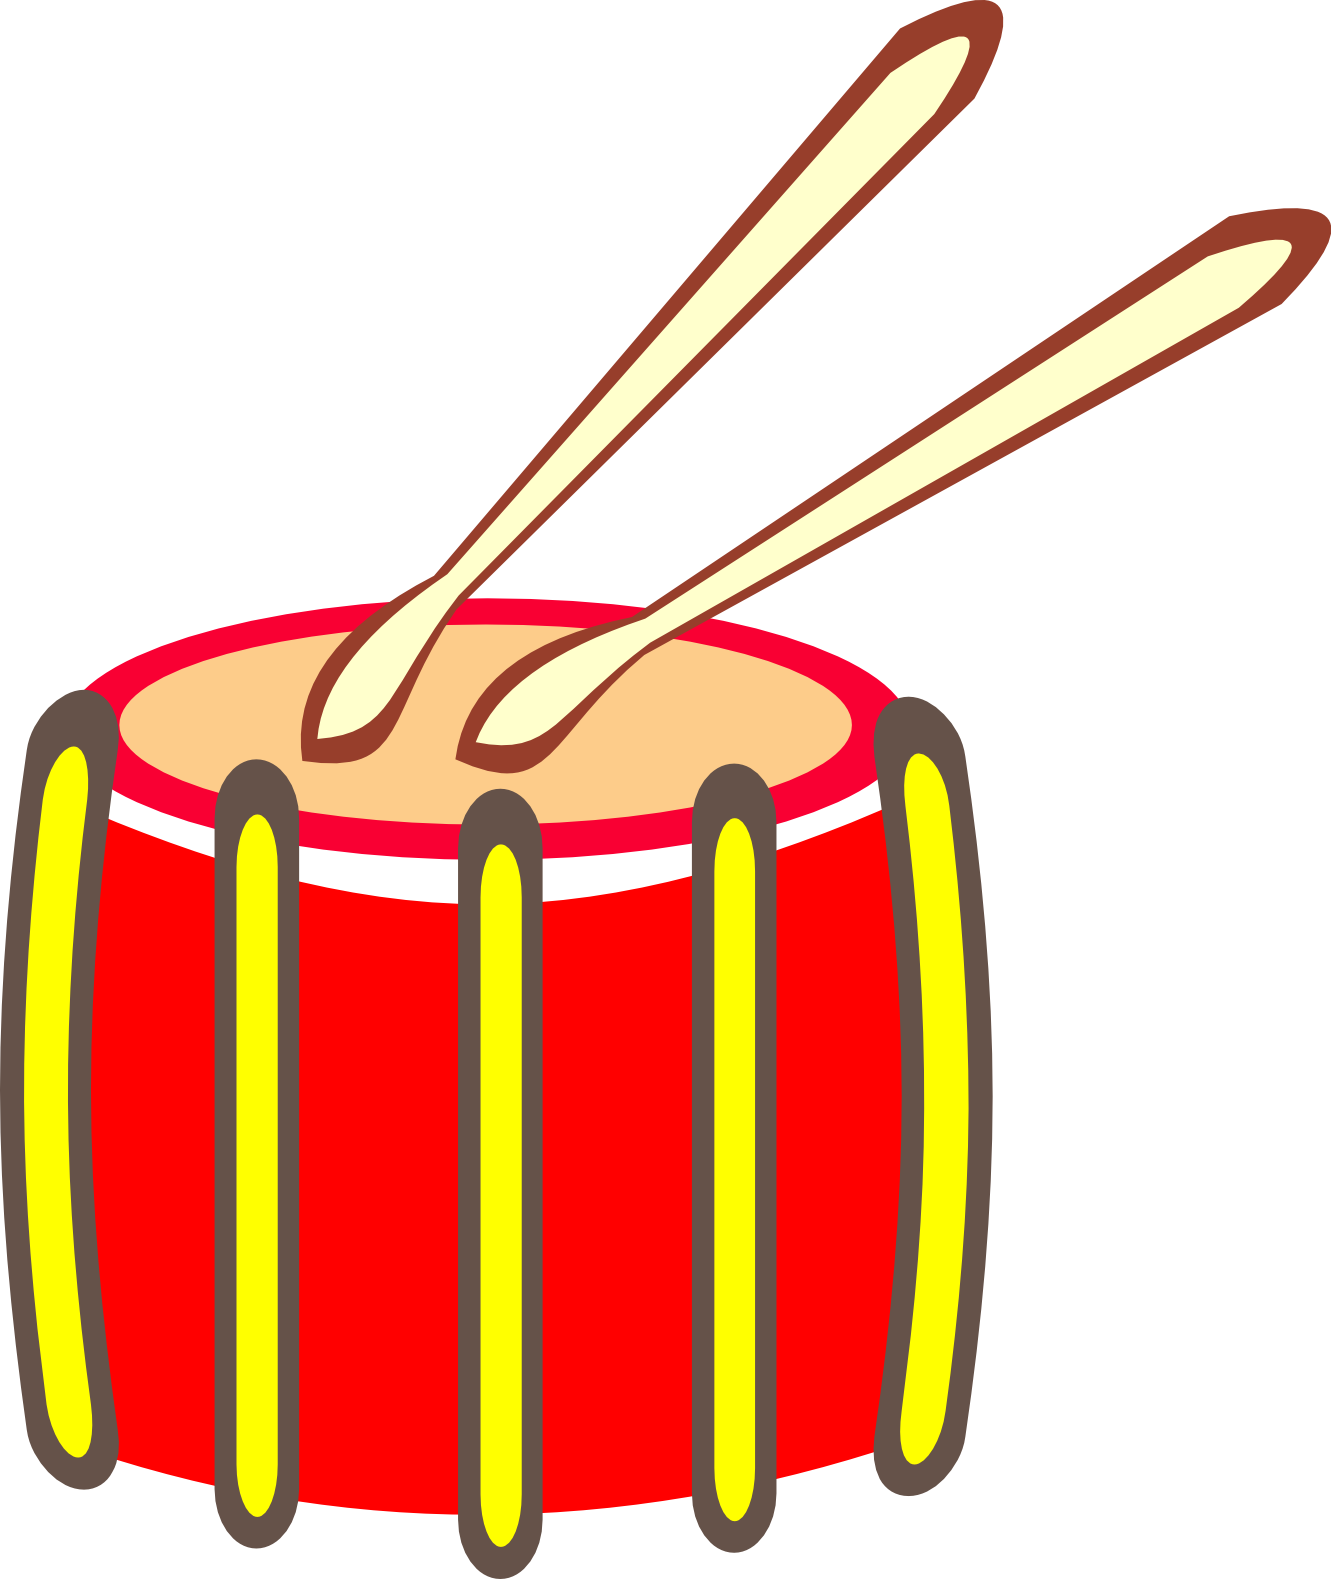 Drum clipart toy drum. Drums free clip art